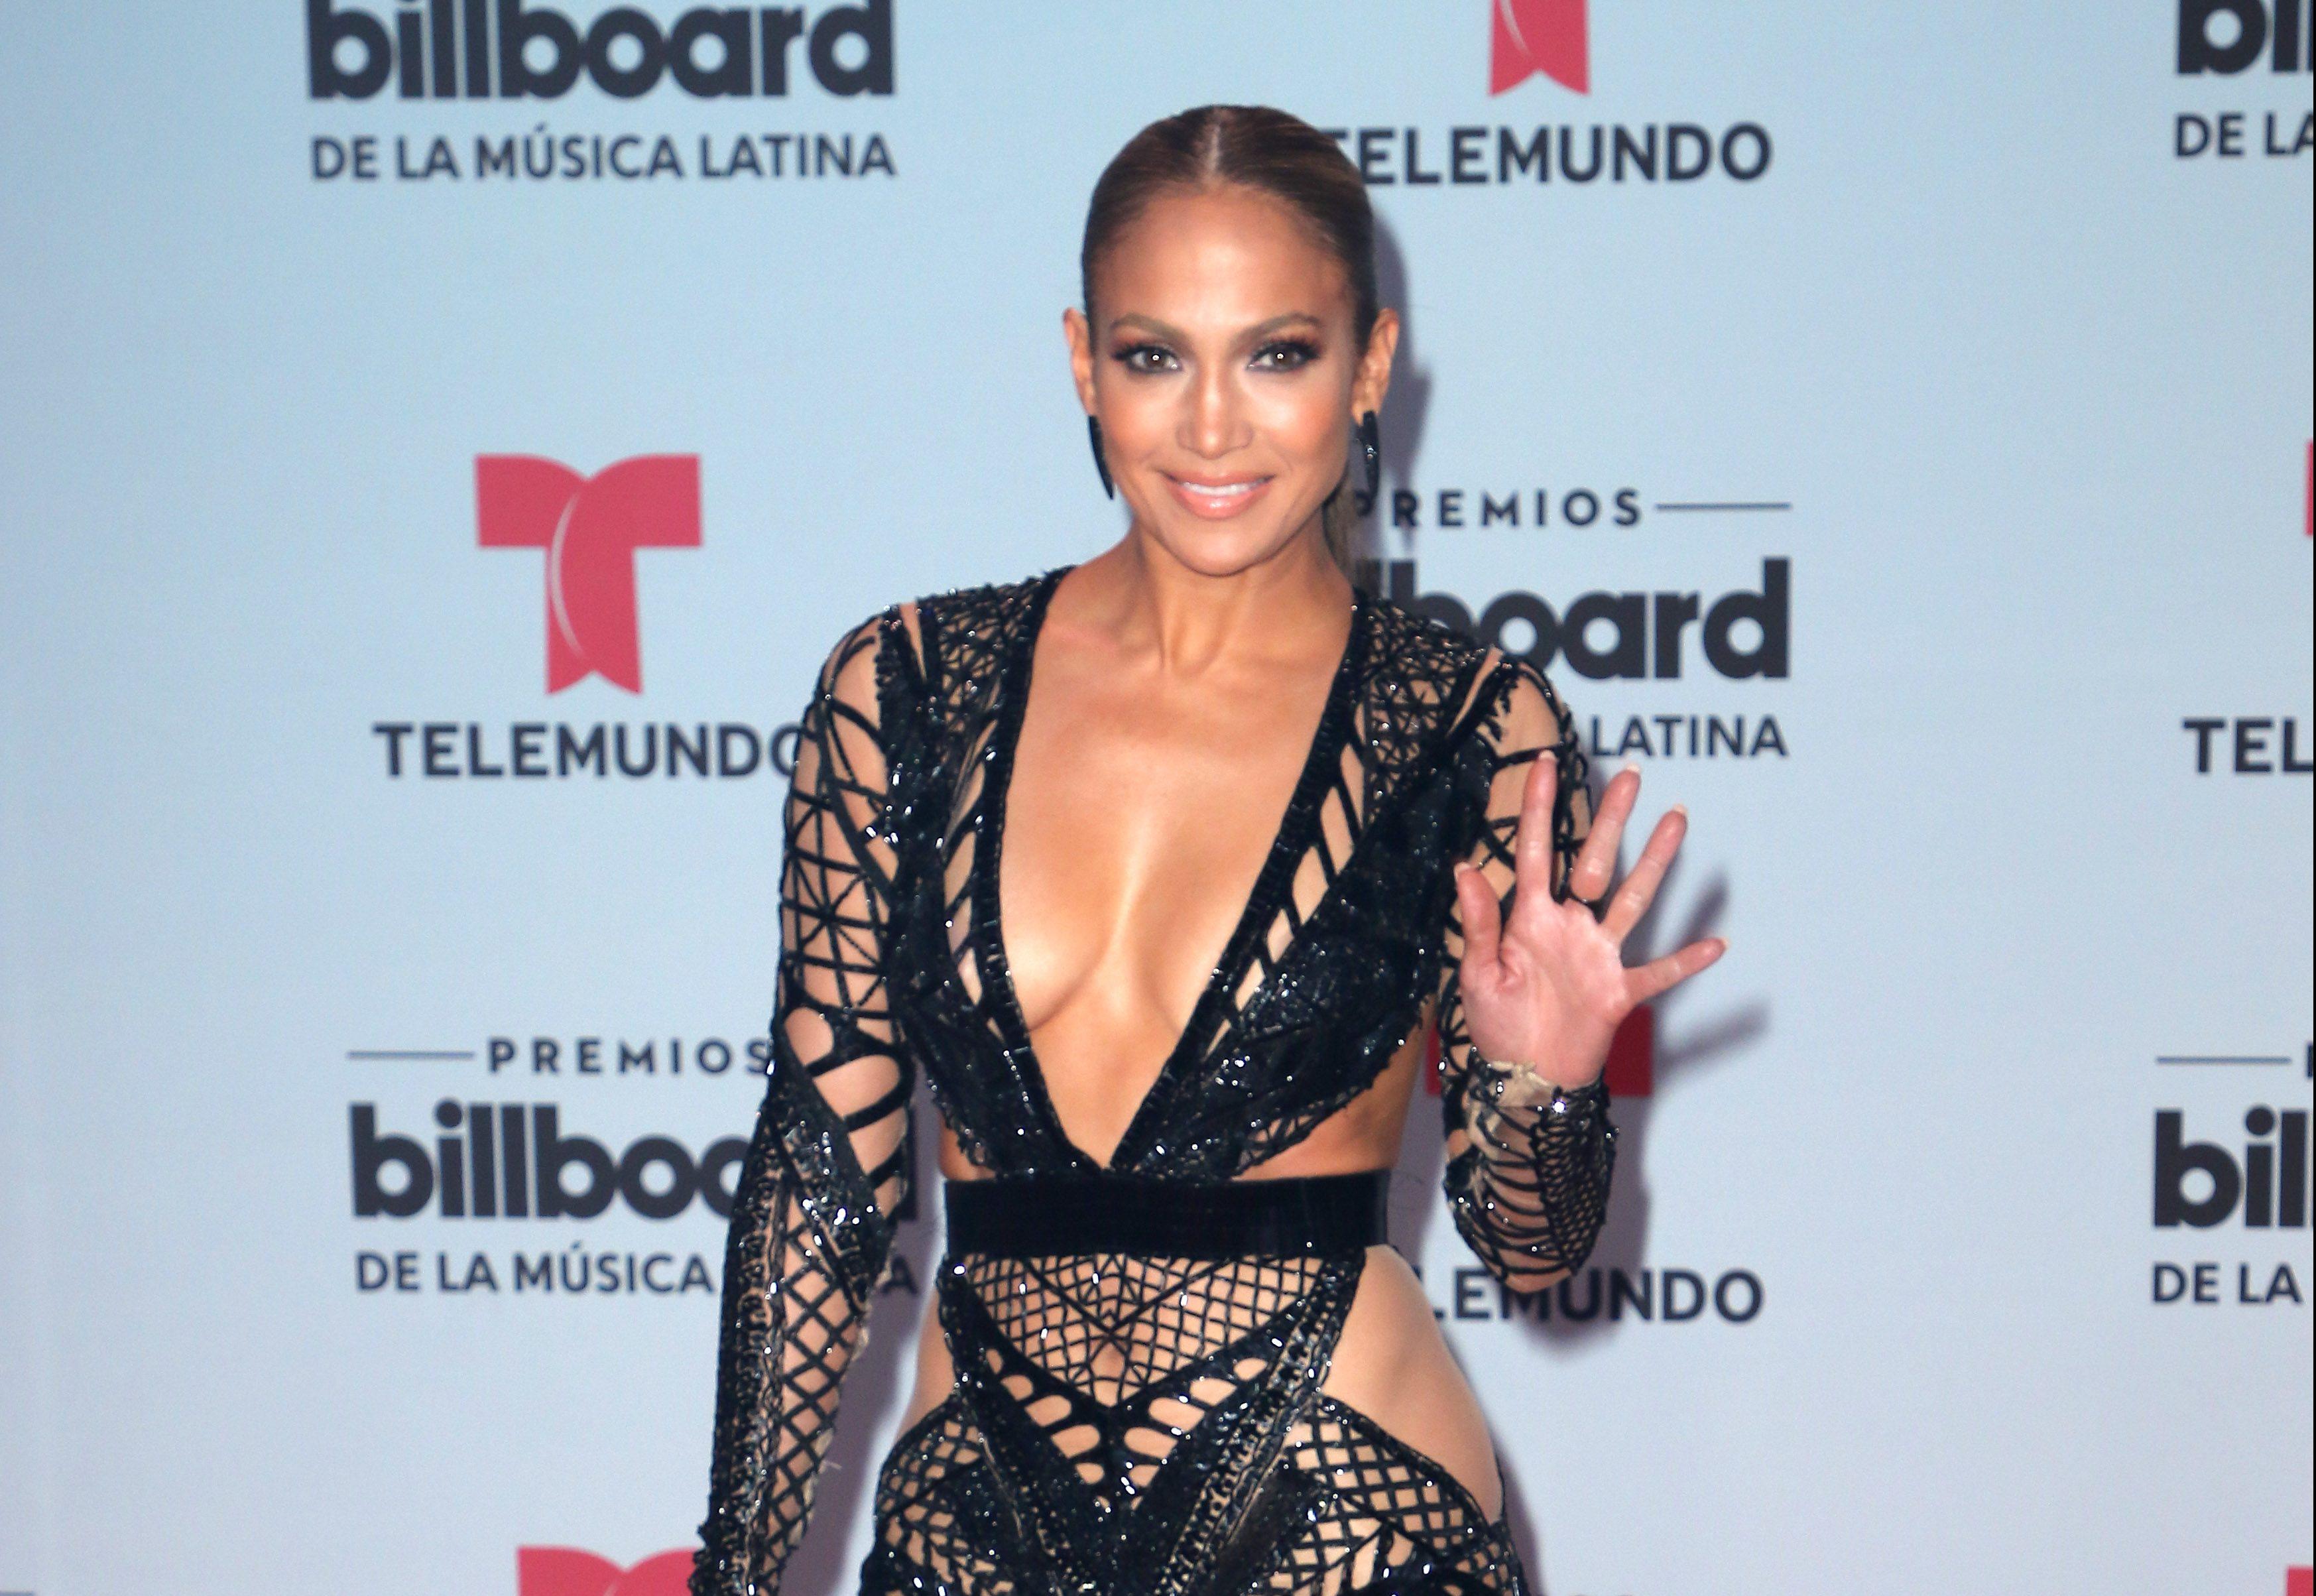 Jennifer López publica video sin brasier y enloquece las redes - Tropicana  Bogotá d5924fdffc8f